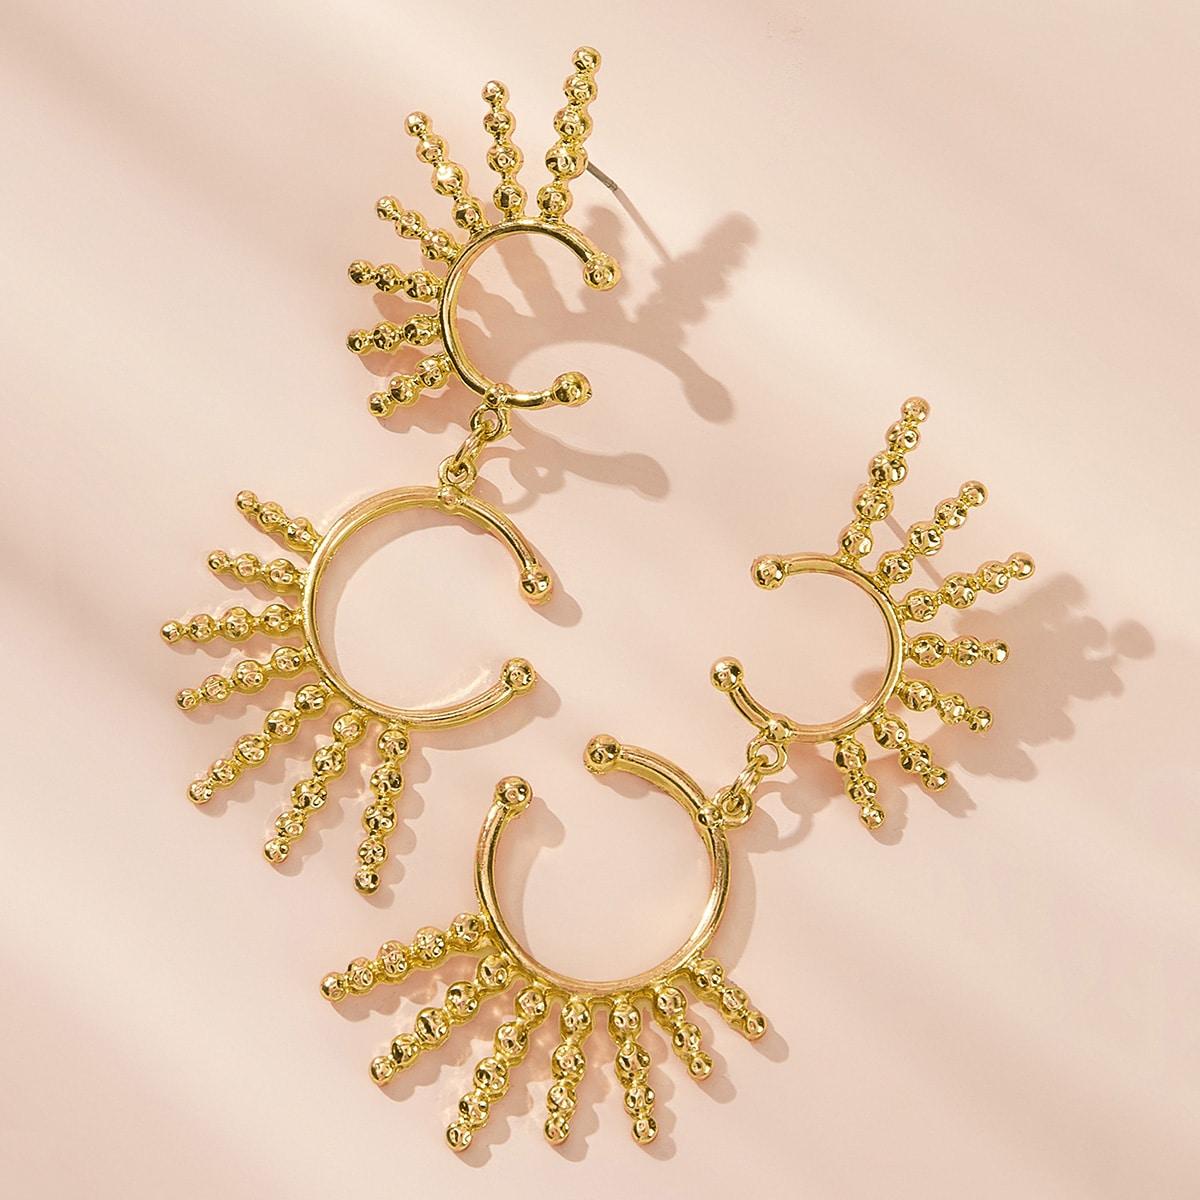 1pair Sun Design Metallic Drop Earrings